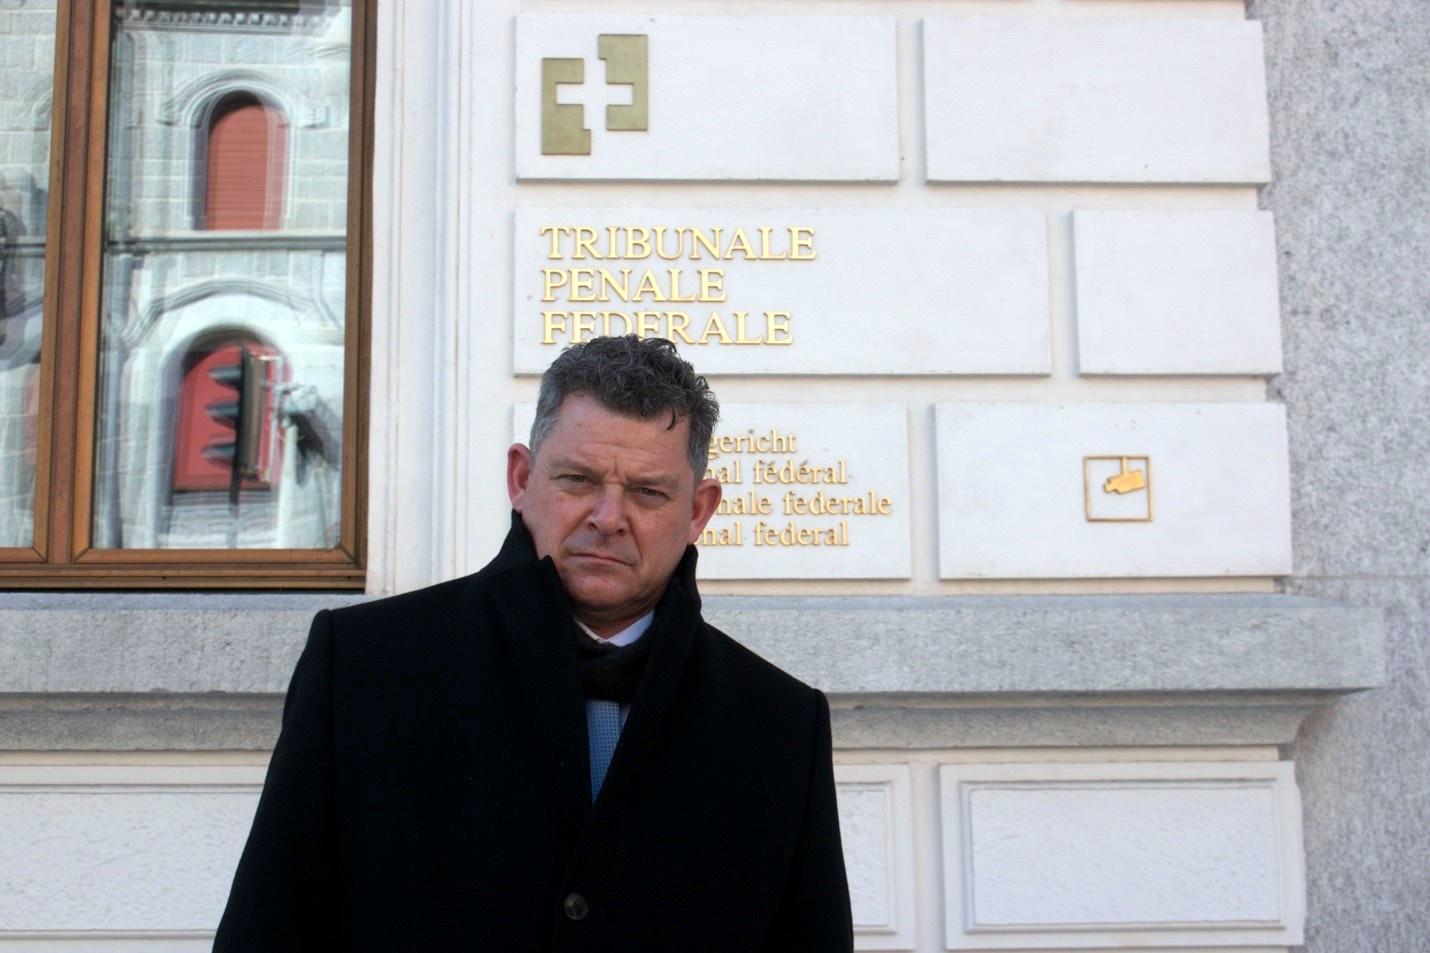 Dmitri Gianoli, lawyer of war crimes suspect Alieu Kosiah, before the Federal Criminal Court court Bellinzona, Switzerland. New Narratives/James Harding Giahyue